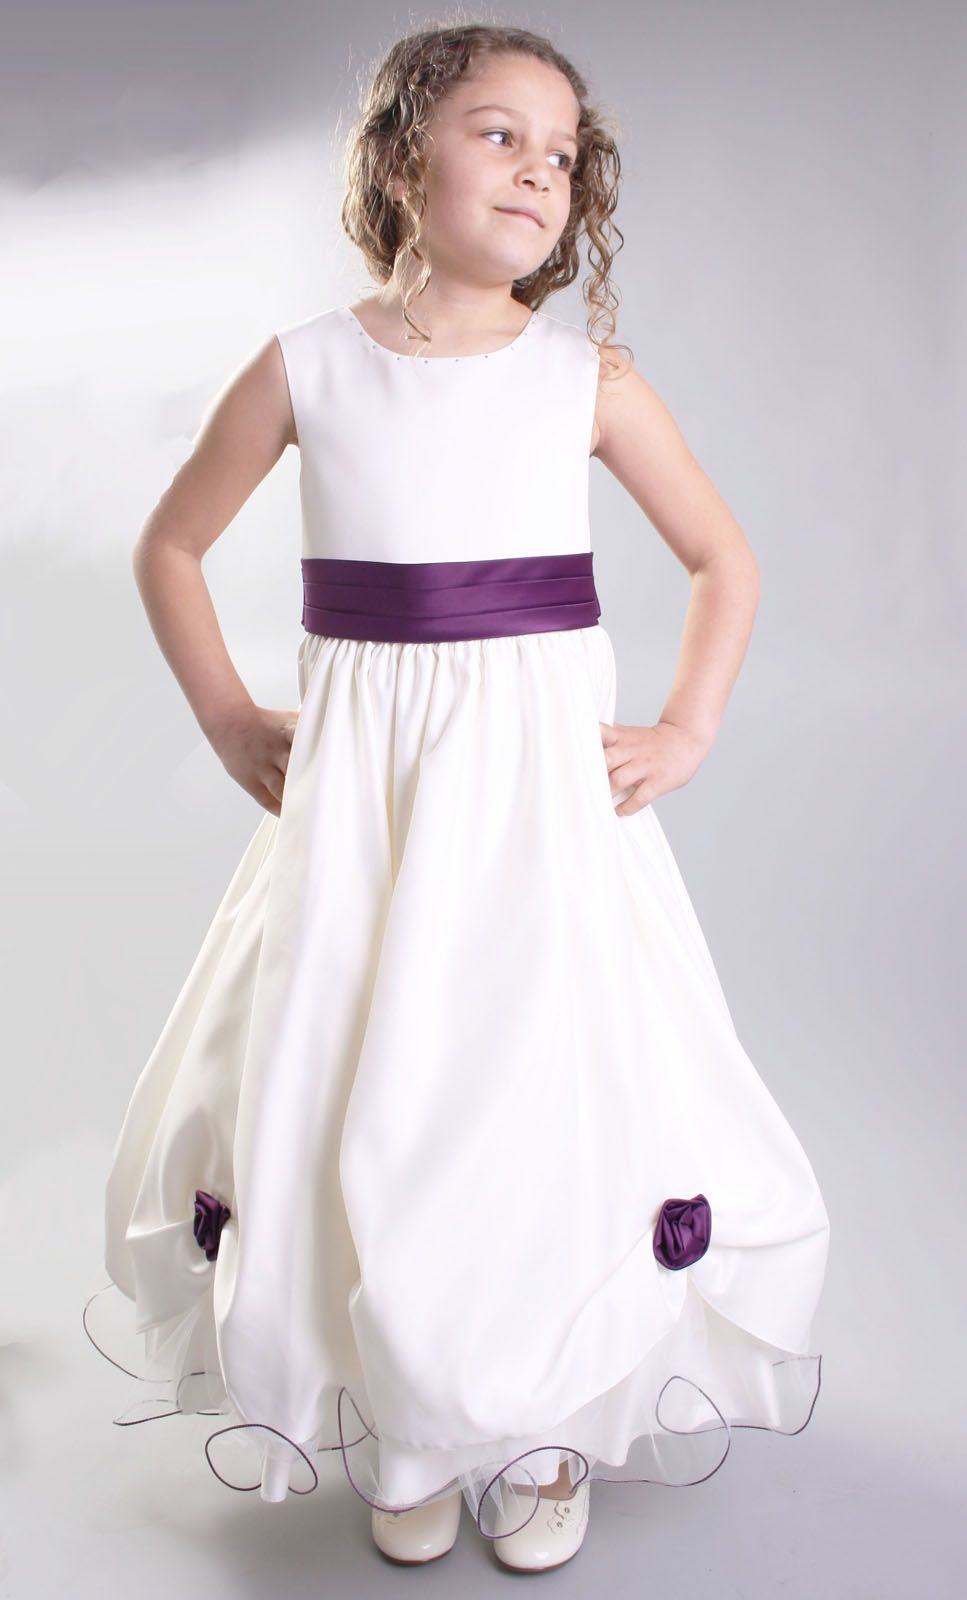 2a692b05bb5 Flower girl dresses cadburys purple bridesmaid dress